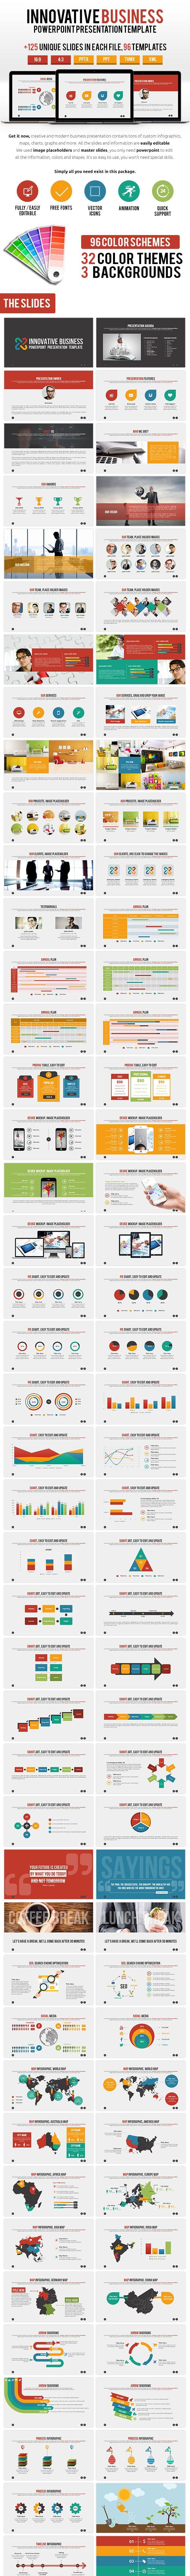 innovative business powerpoint presentation by spriteit graphicriver